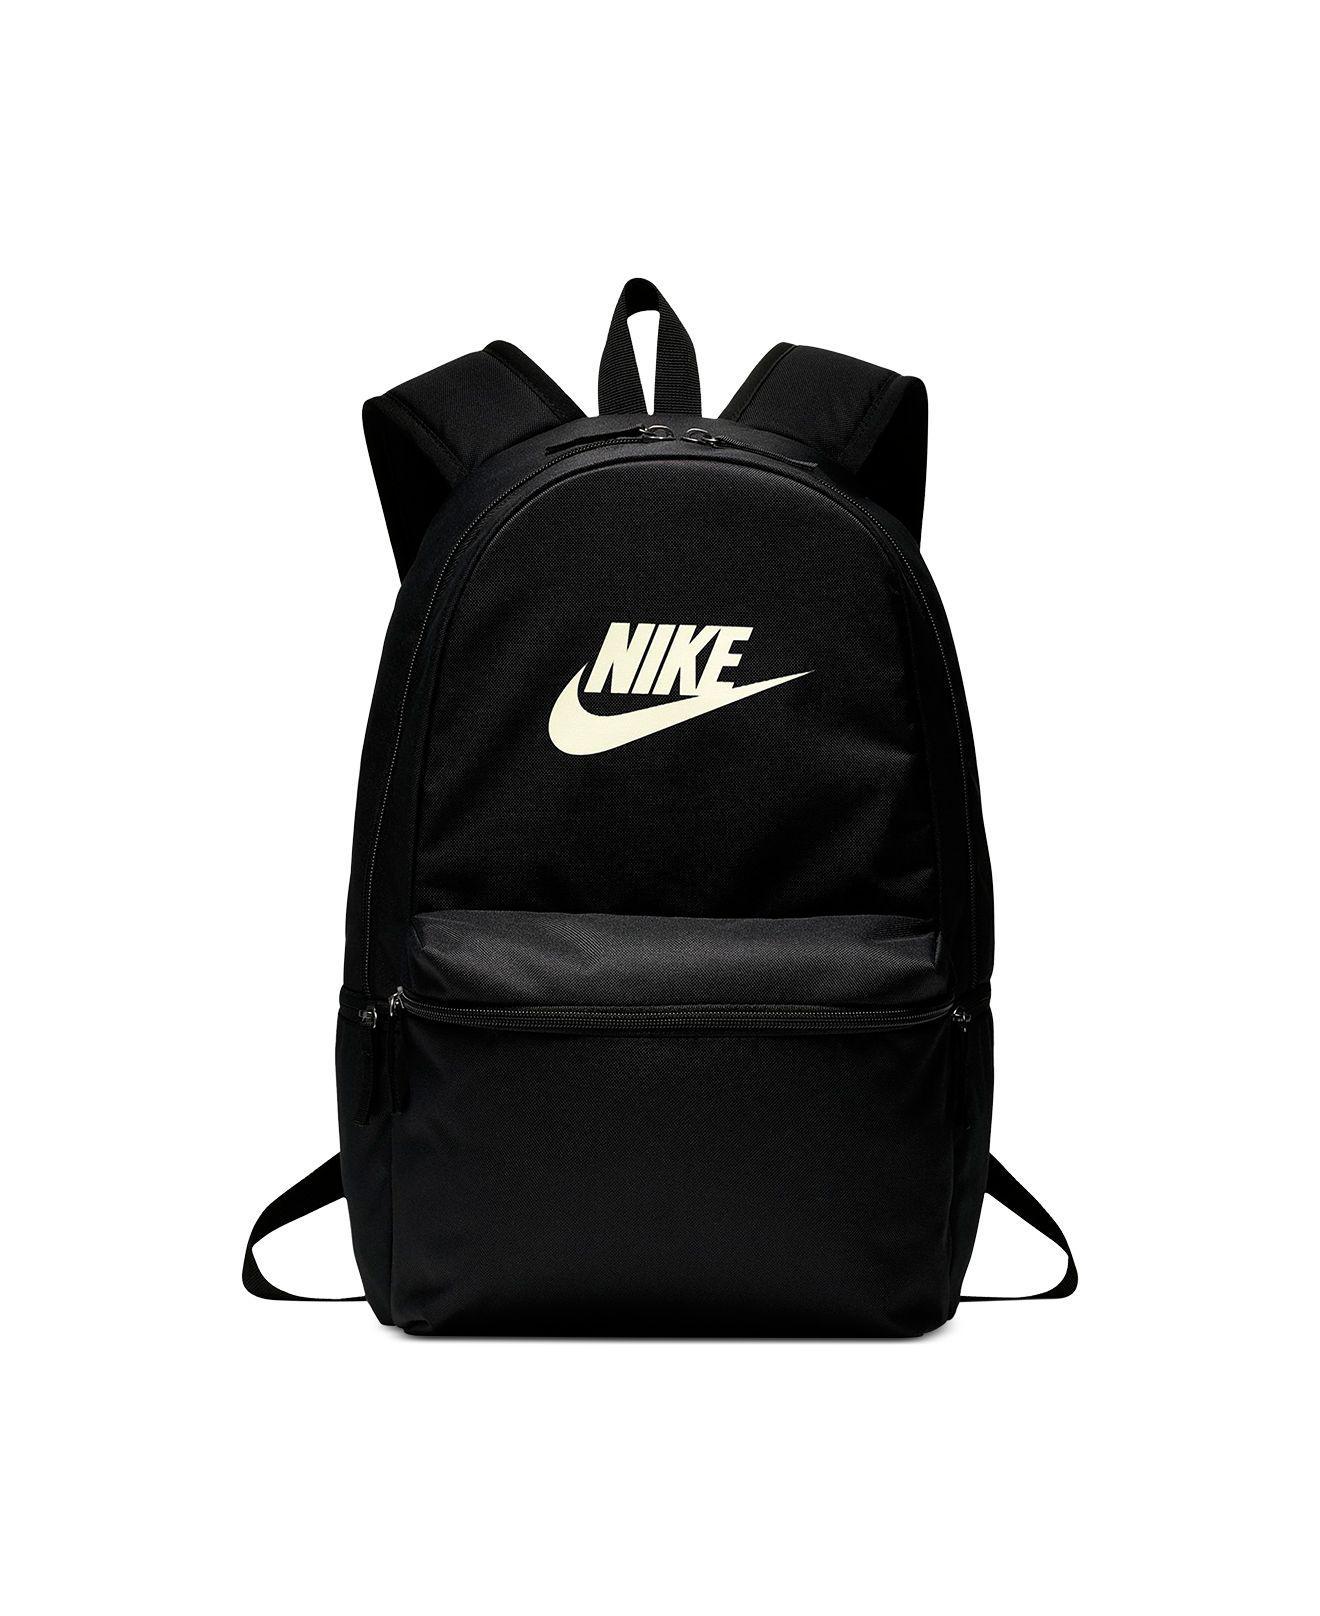 Lyst - Nike Heritage Metallic-logo Backpack in Black 72548e1db13a